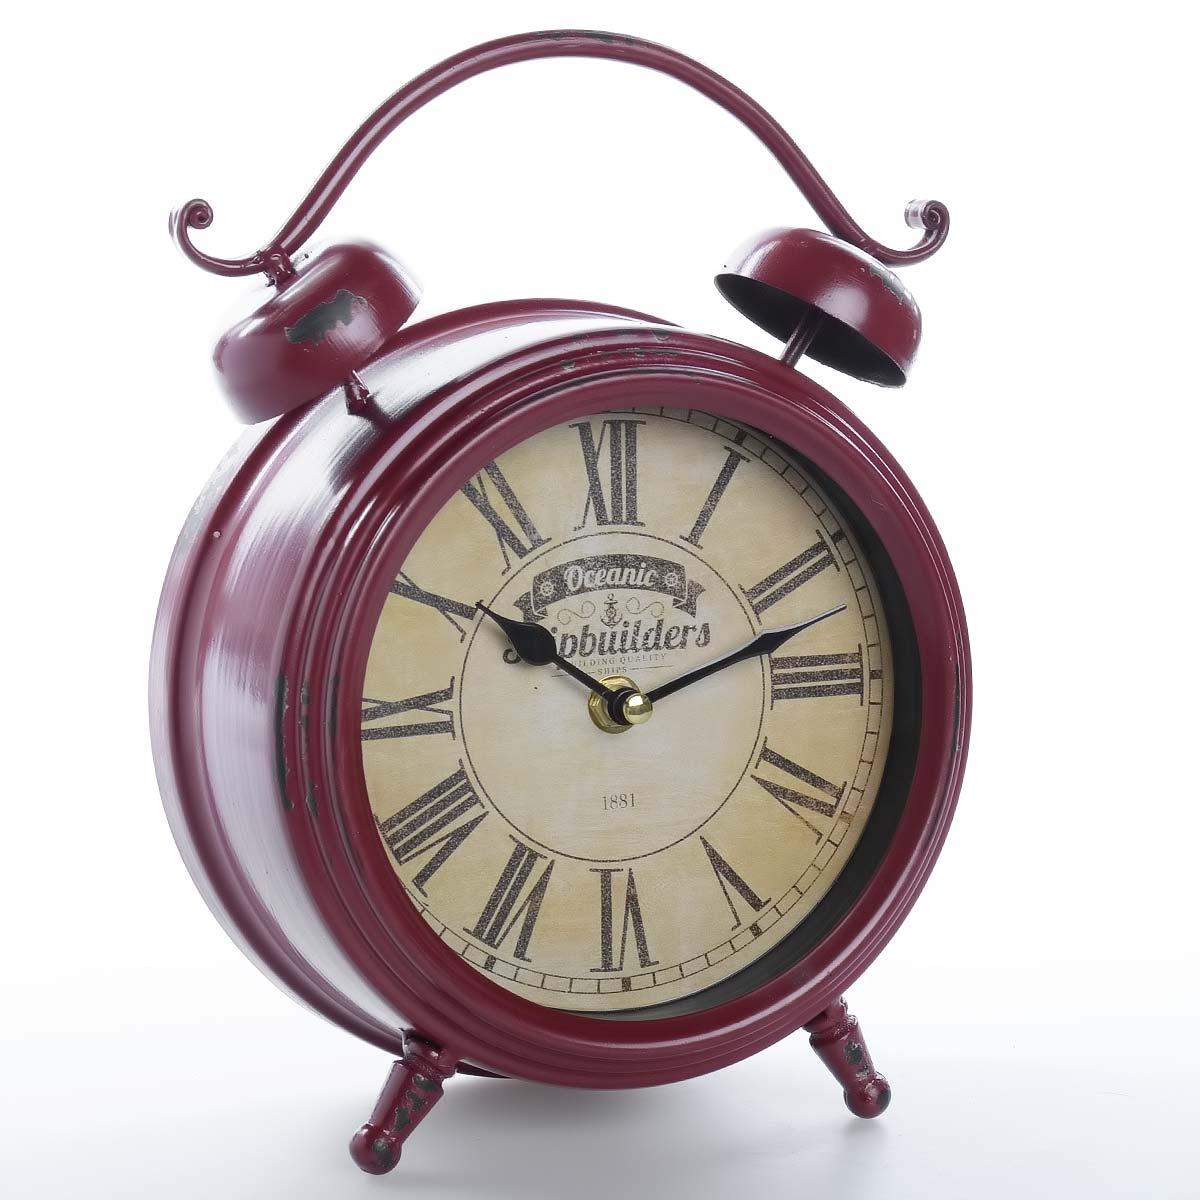 Vintage χειροποίητο διακοσμητικό ρολόι μεταλλικό - ΟΕΜ 51551